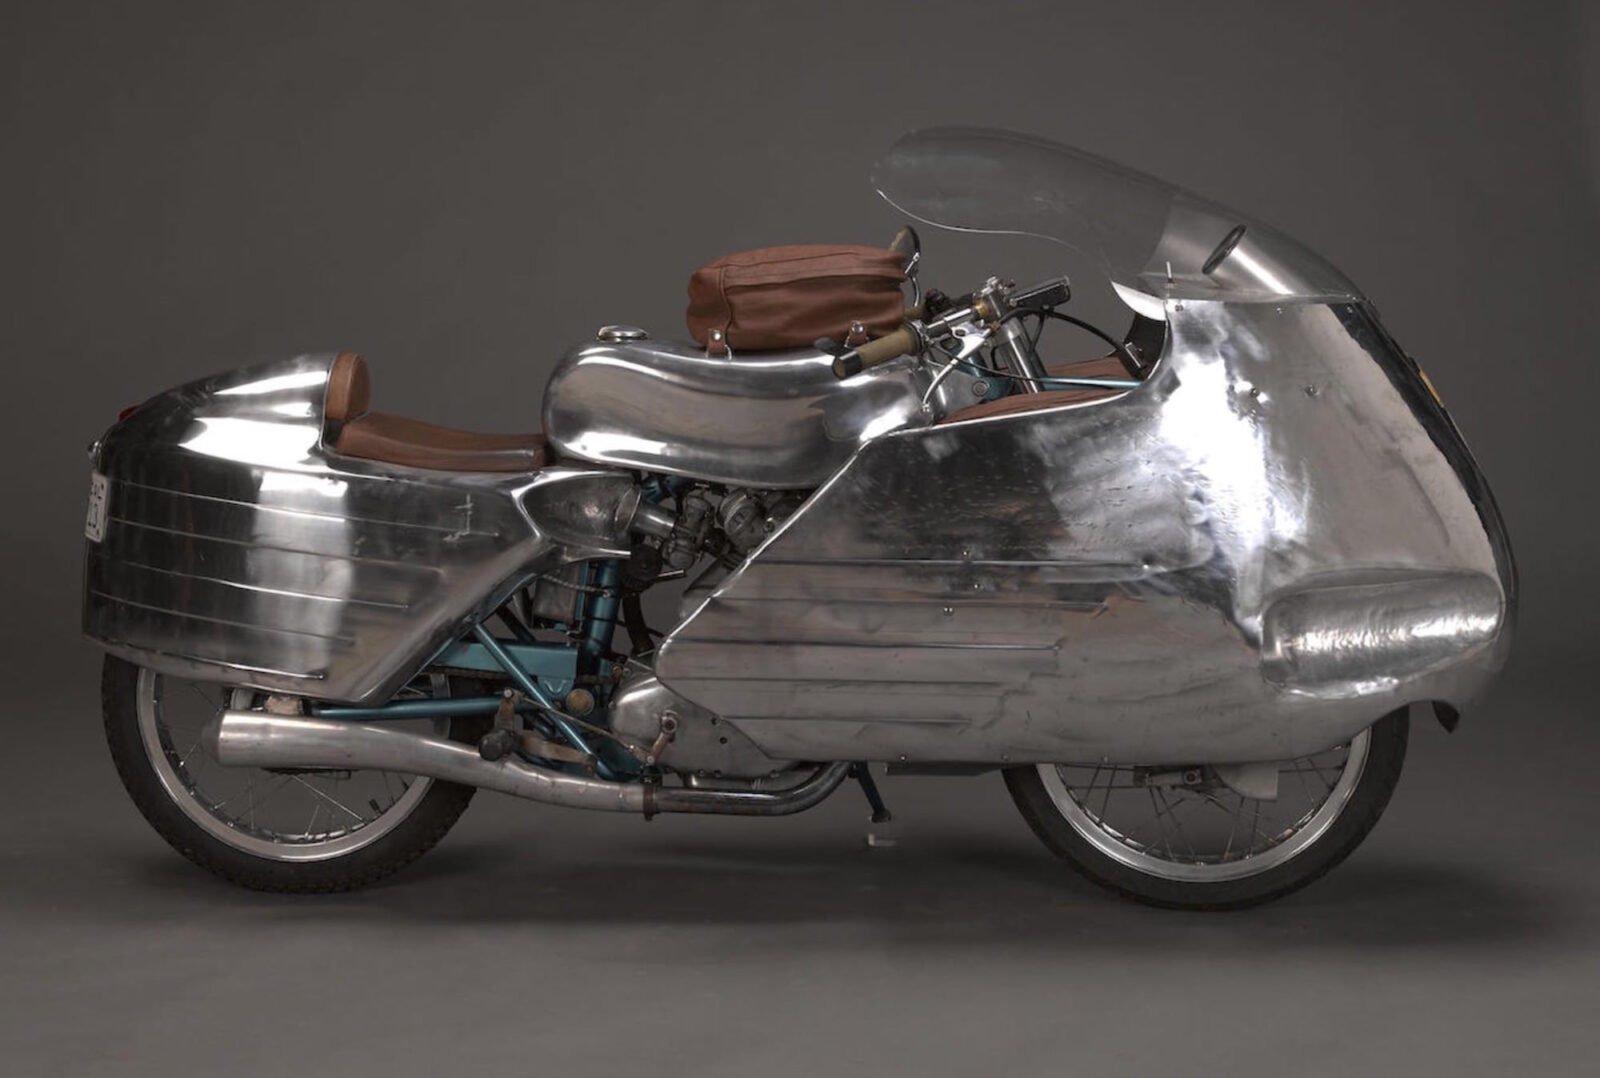 Ducati 175cc Dustbin Special 1600x1078 - Ducati Dustbin Special